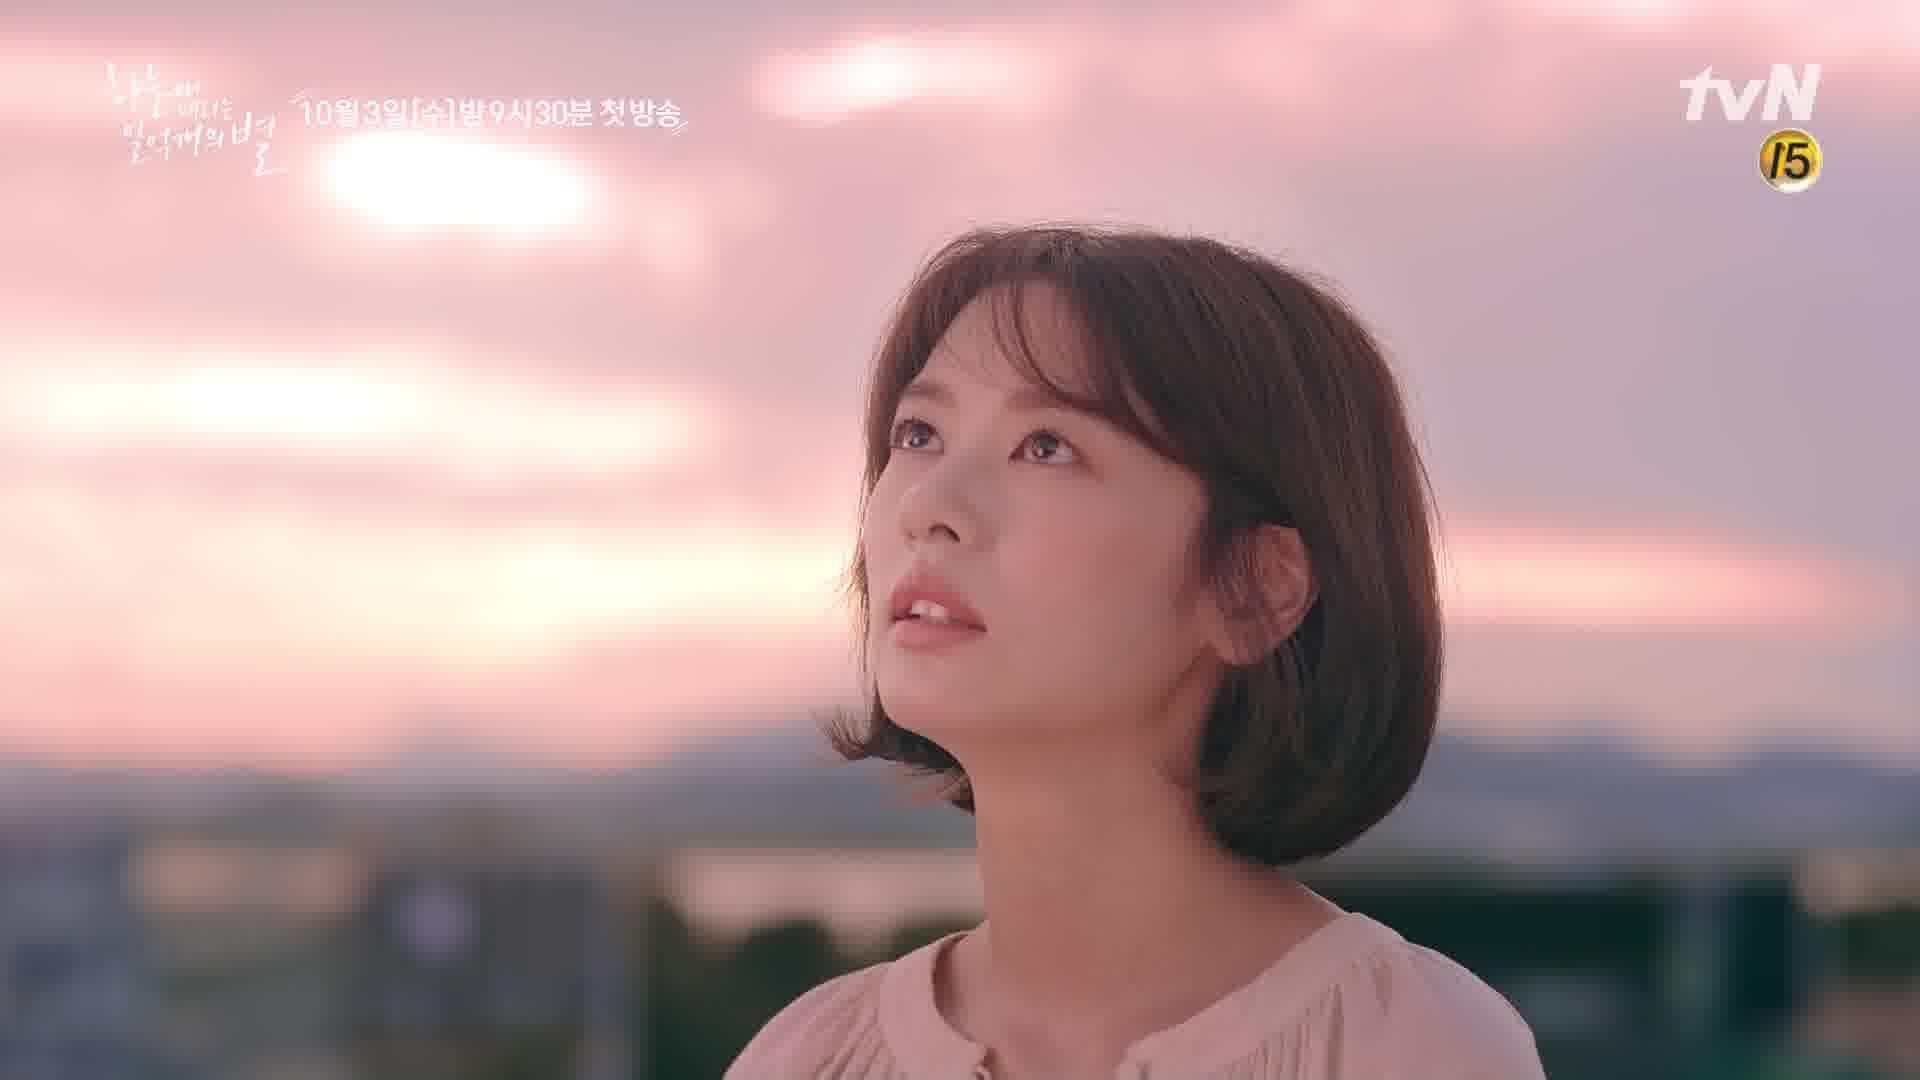 Character Teaser 2 - Jung So Min: La sonrisa se ha ido de tus ojos